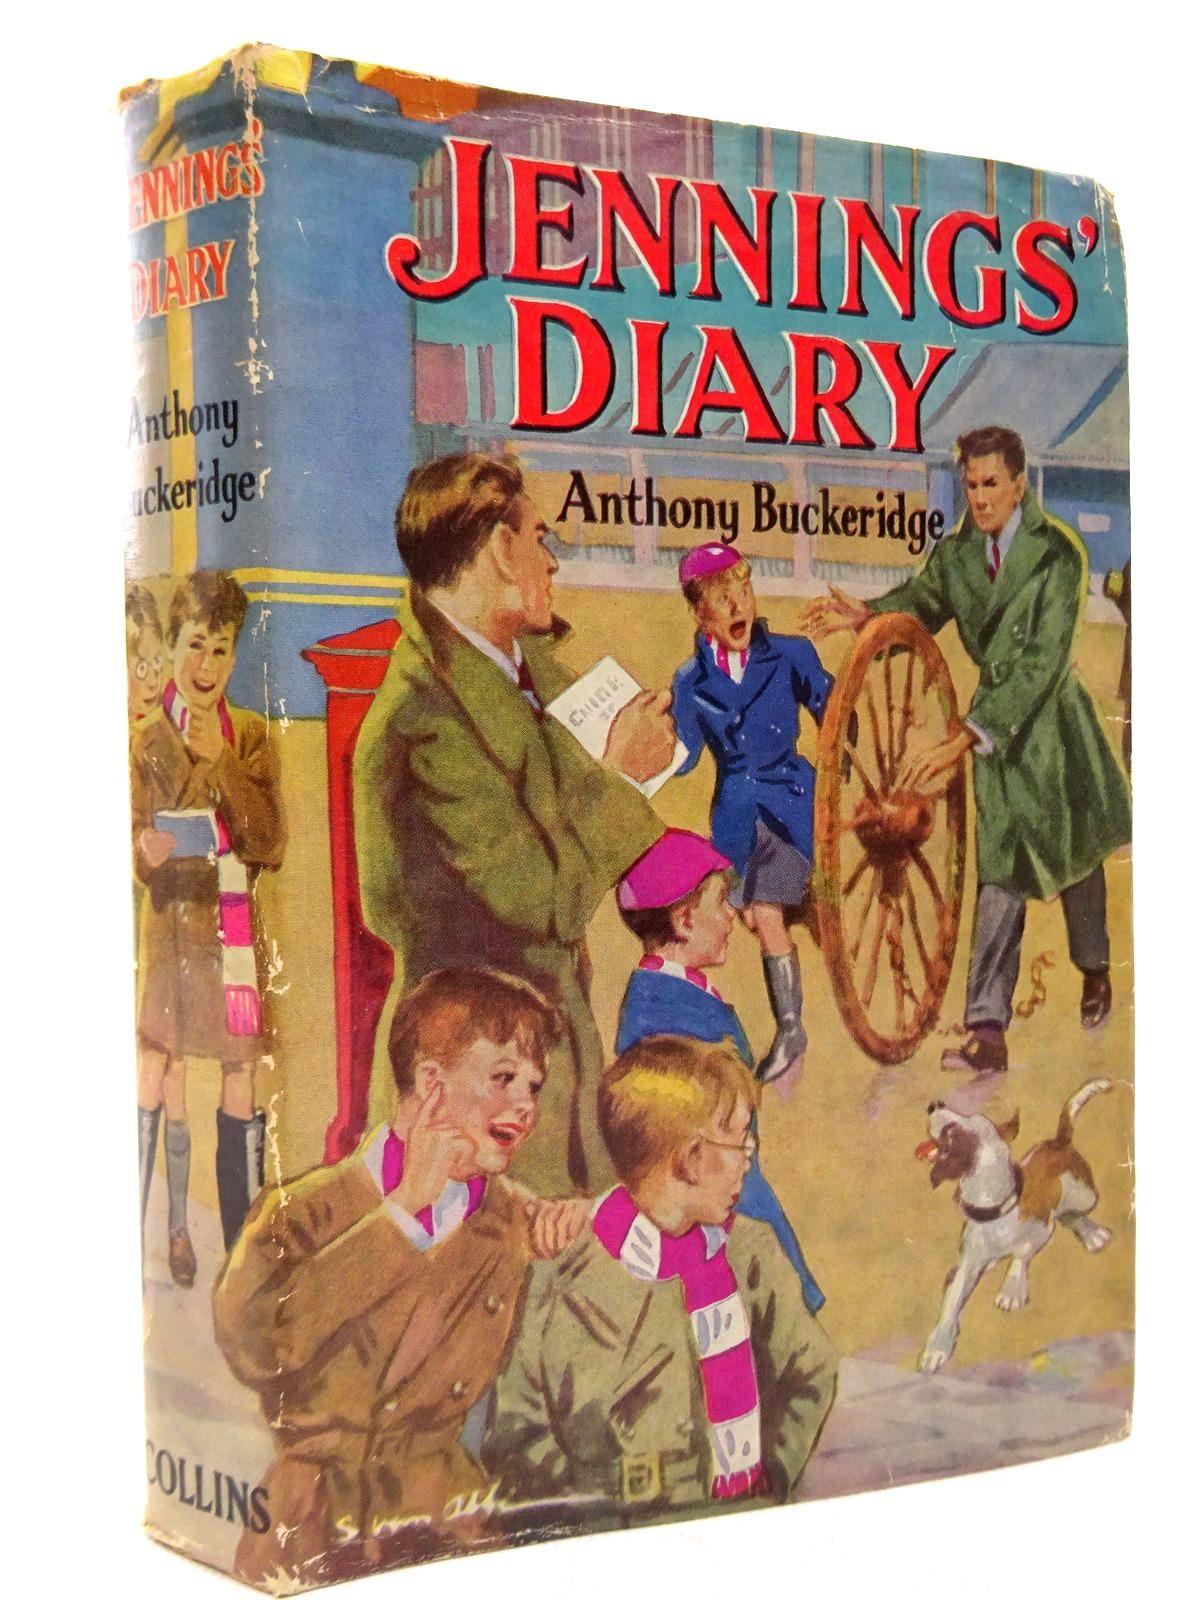 Cover of JENNINGS' DIARY by Anthony Buckeridge